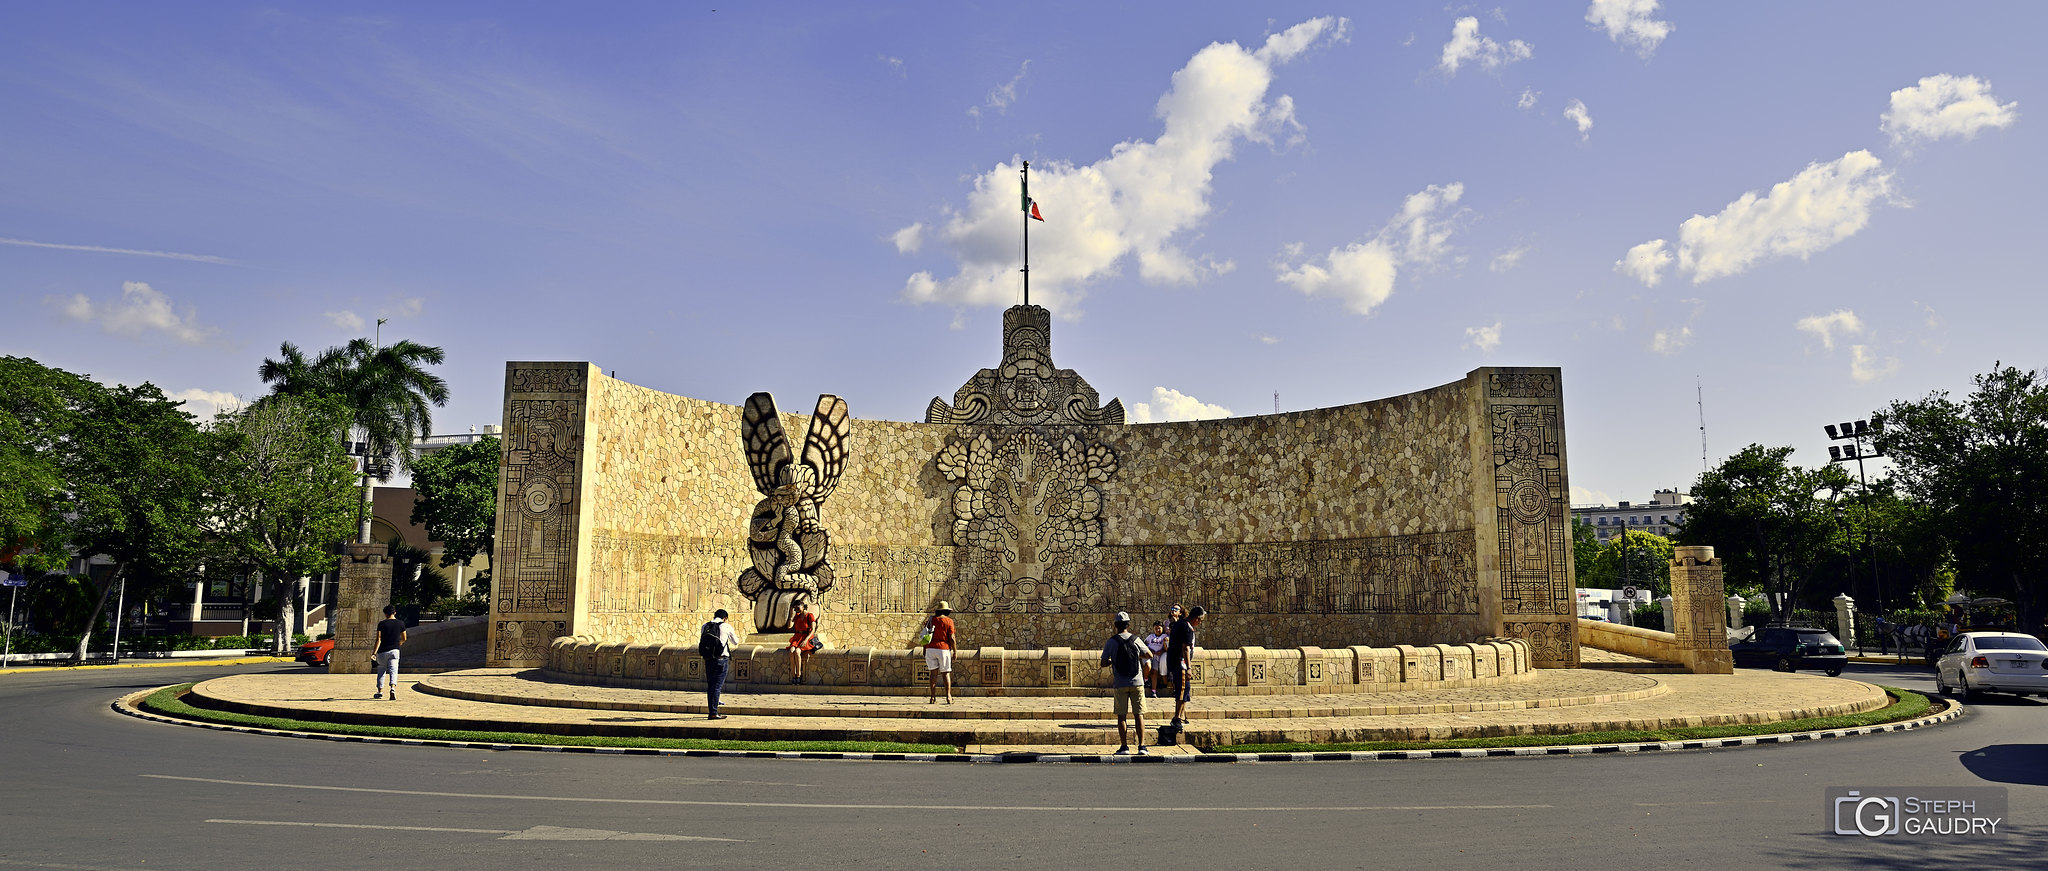 Merida - monument à la Patrie [Klik om de diavoorstelling te starten]